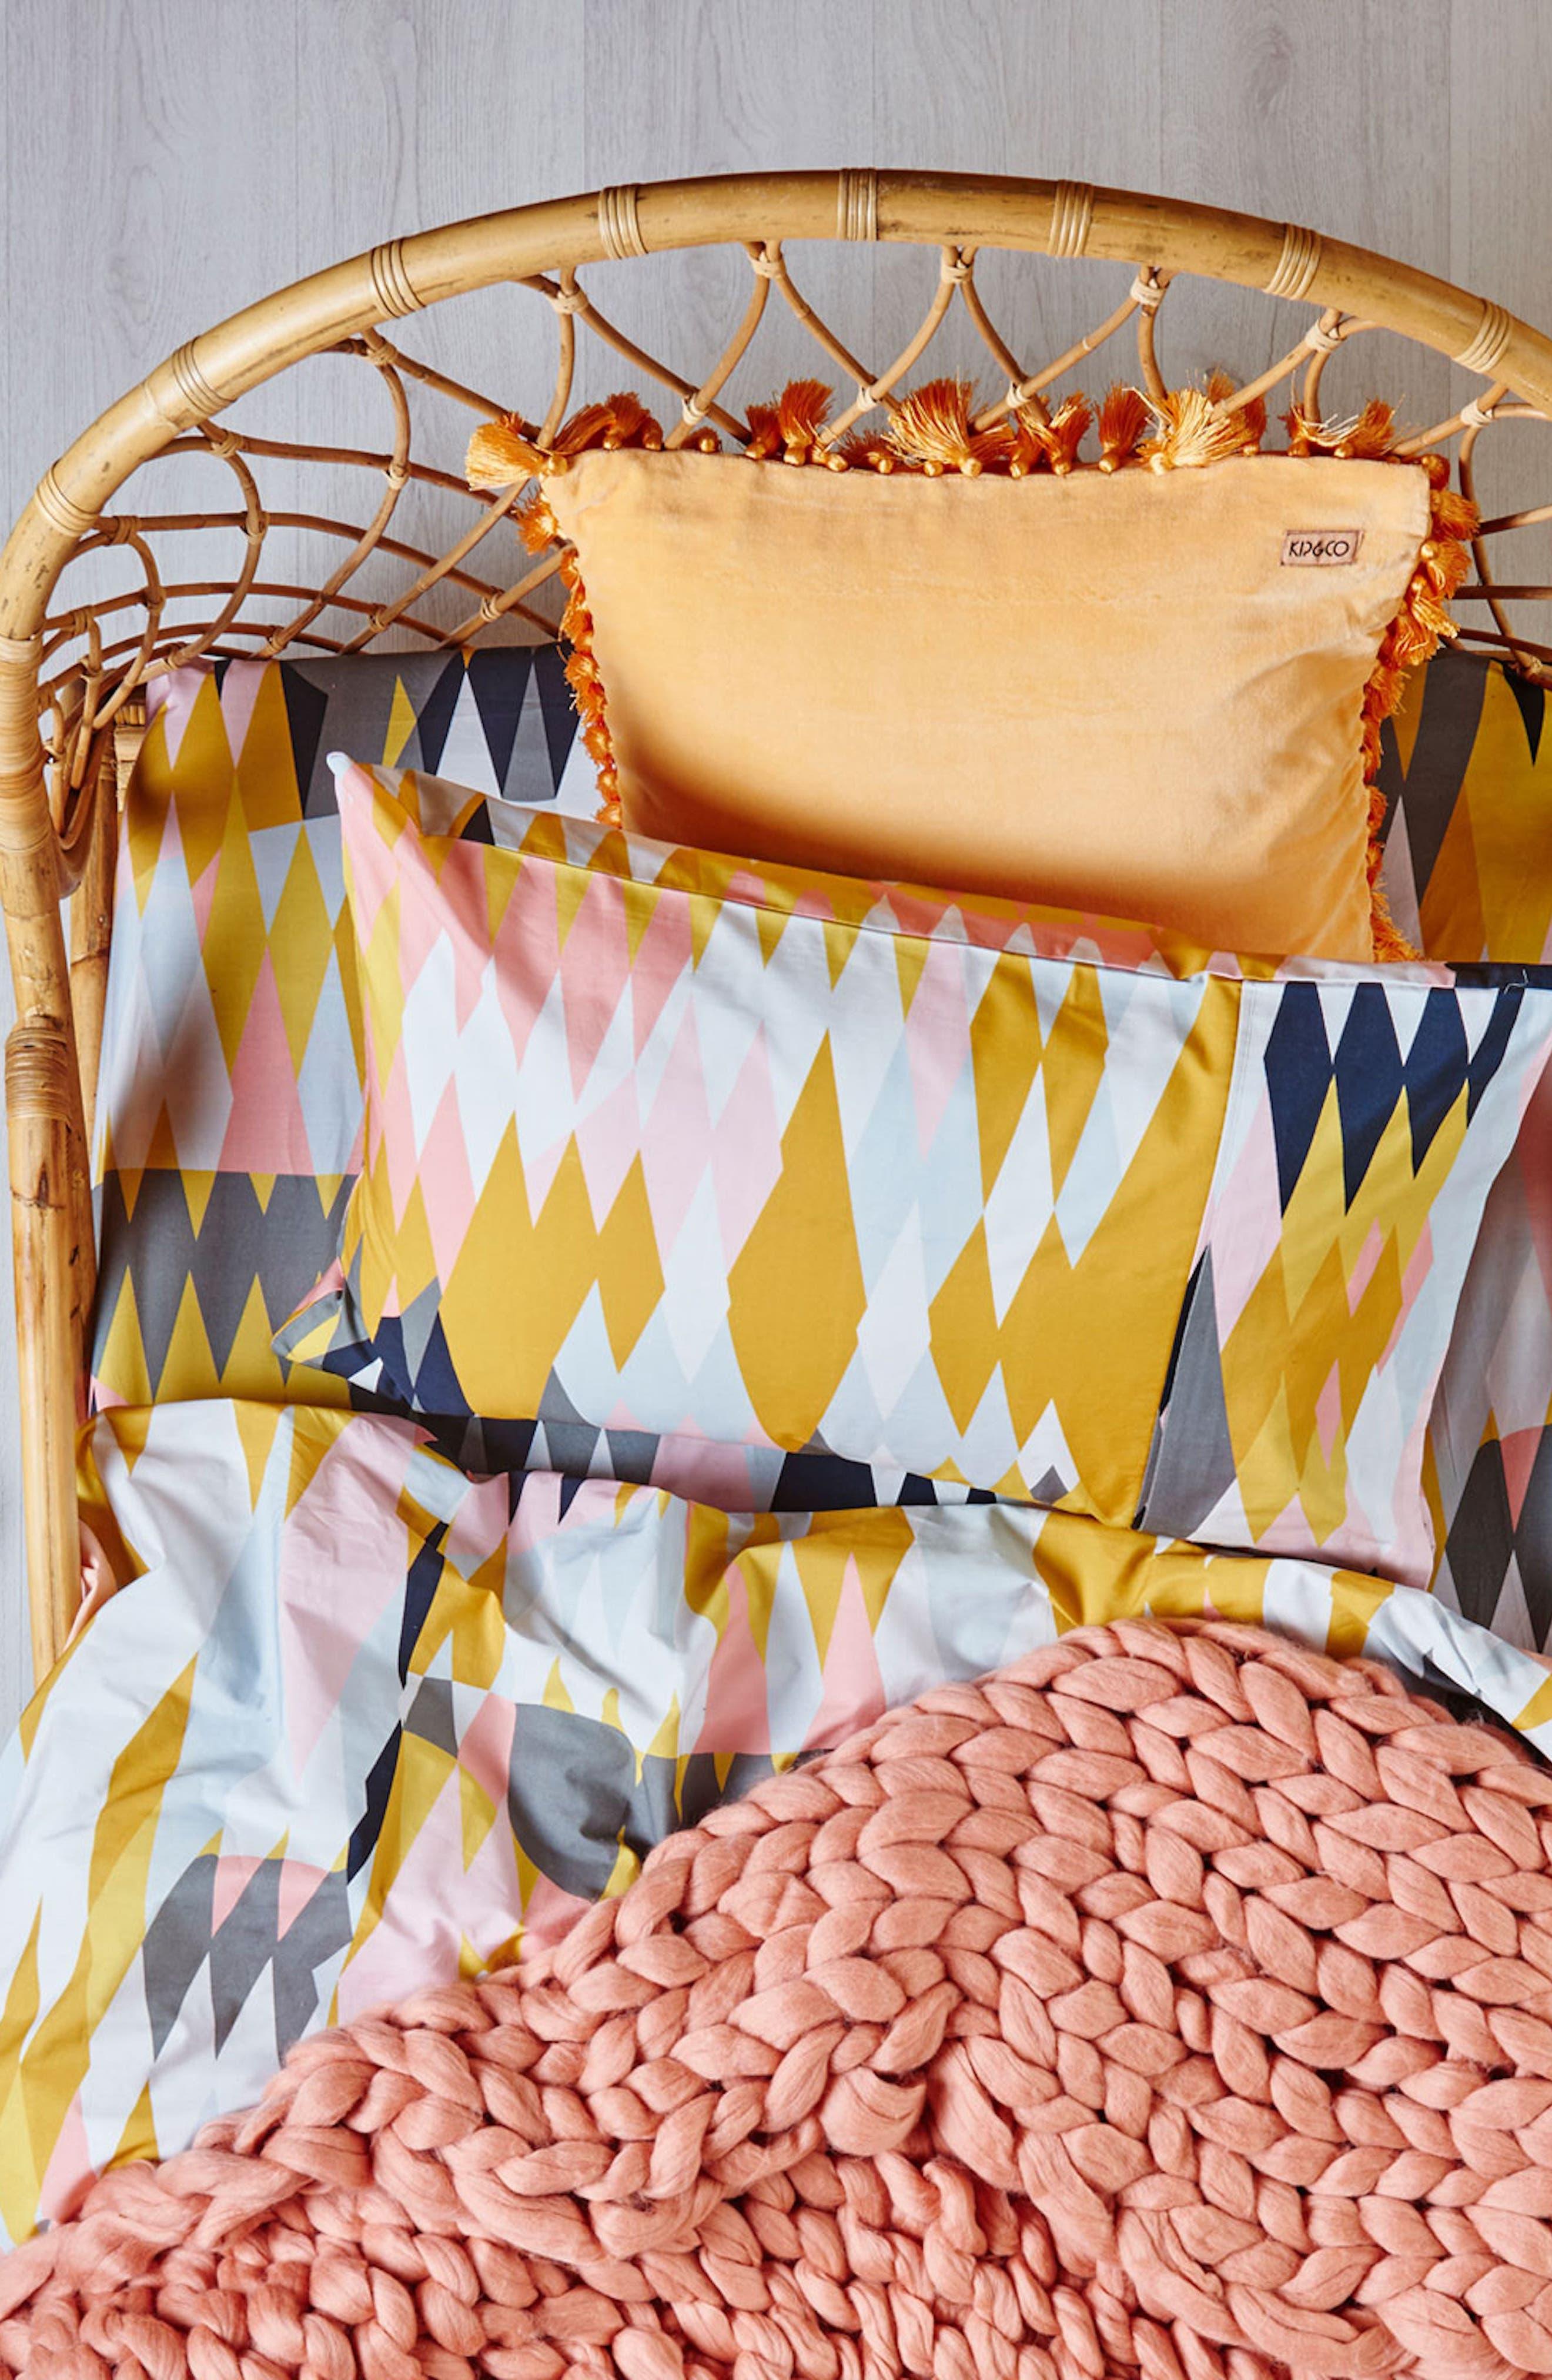 KIP&CO,                             Croc Desert Fitted Cotton Sheet,                             Main thumbnail 1, color,                             100